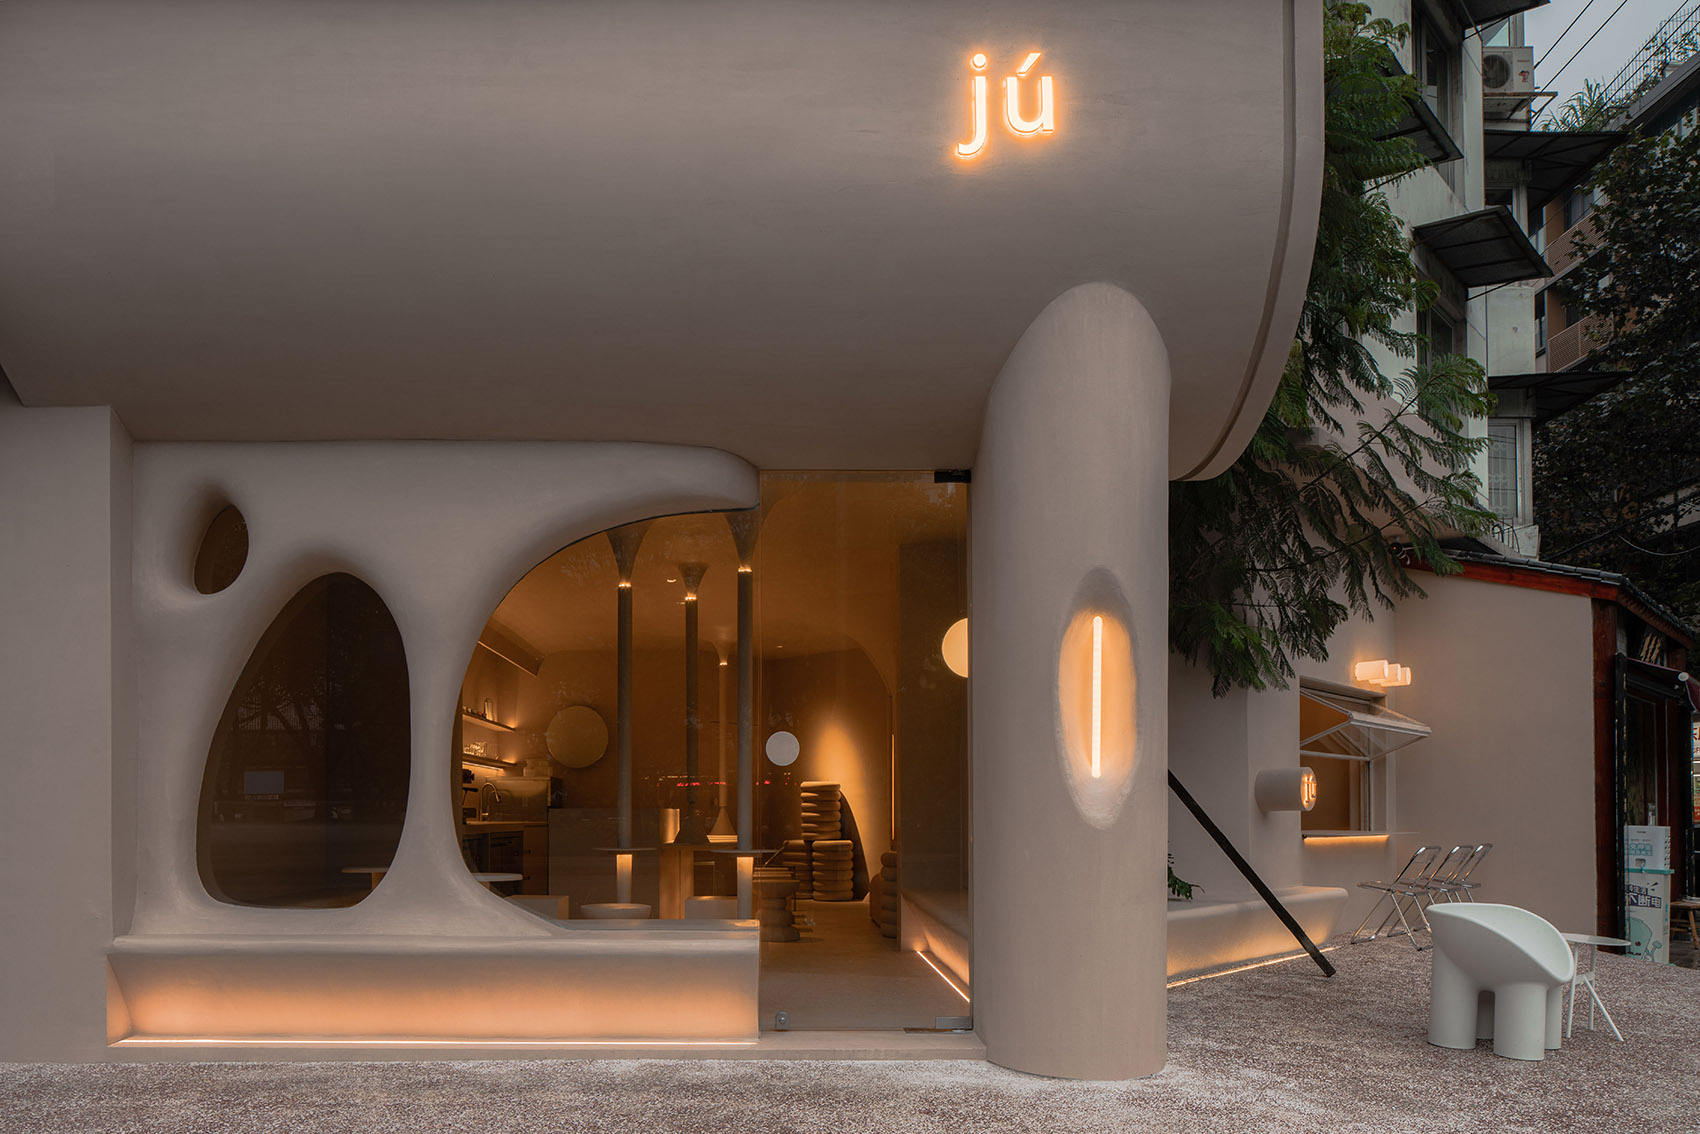 Oval window openings and pillars evoke an ancient troglodyte dwelling